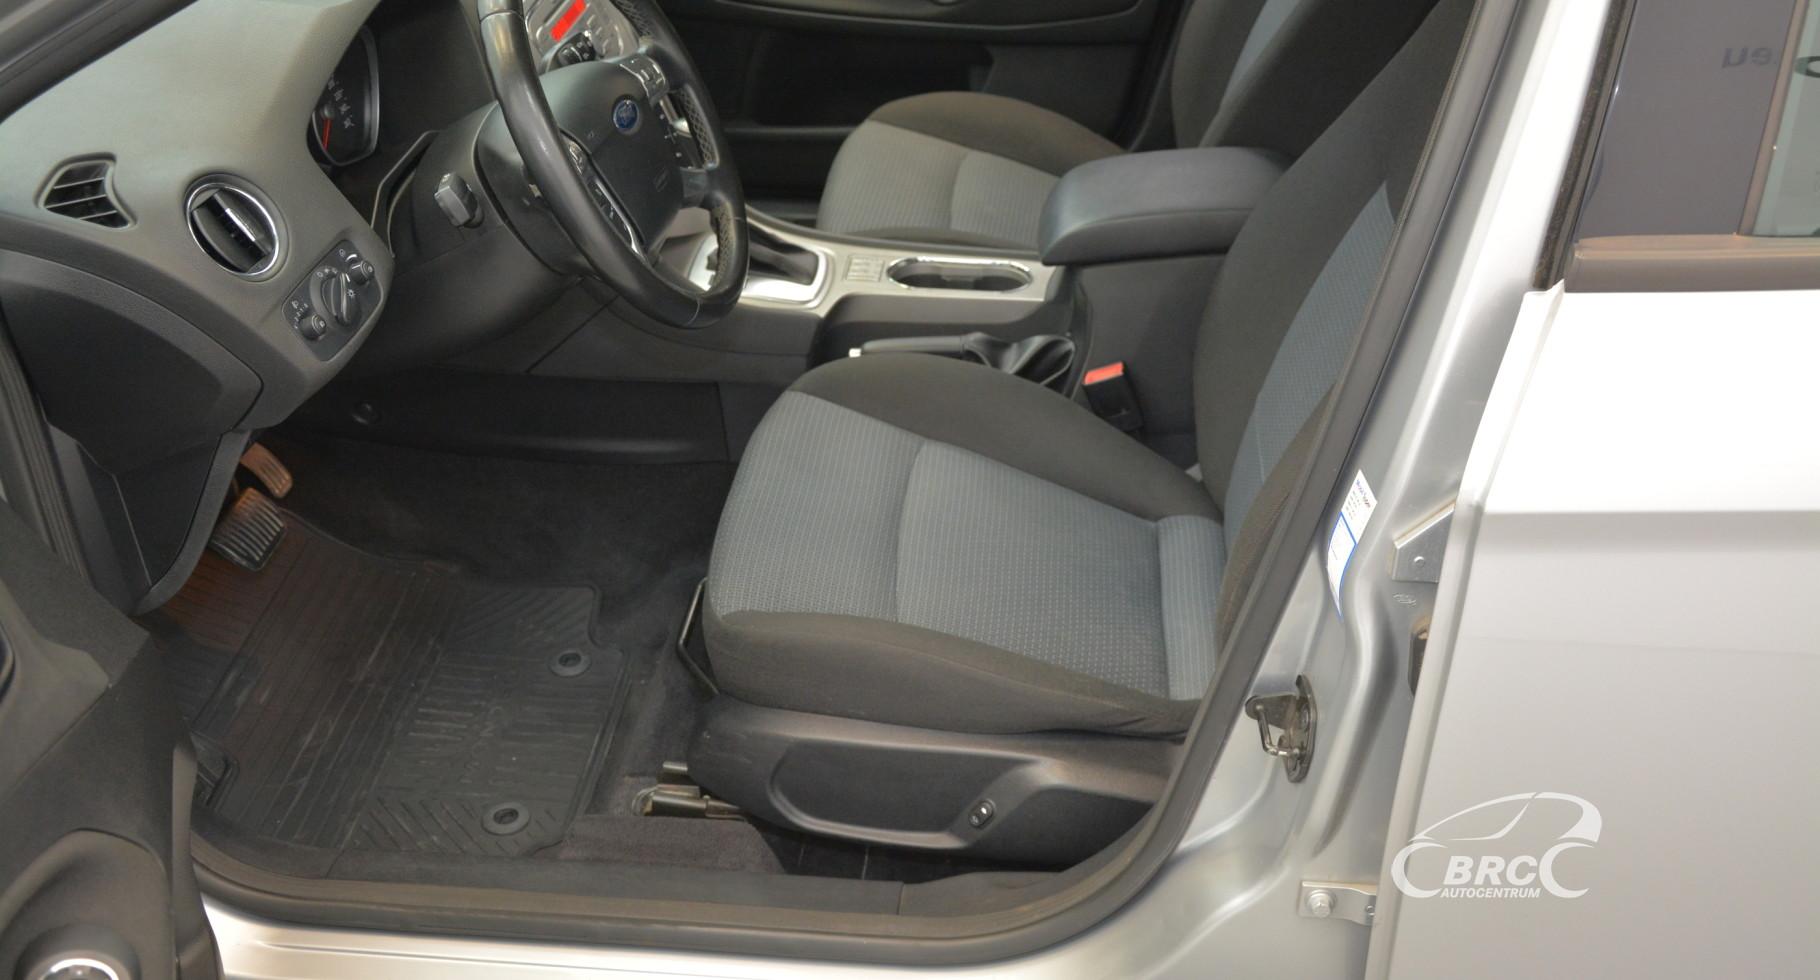 Ford Mondeo 2.0 TDCi Trend hgv Automatas